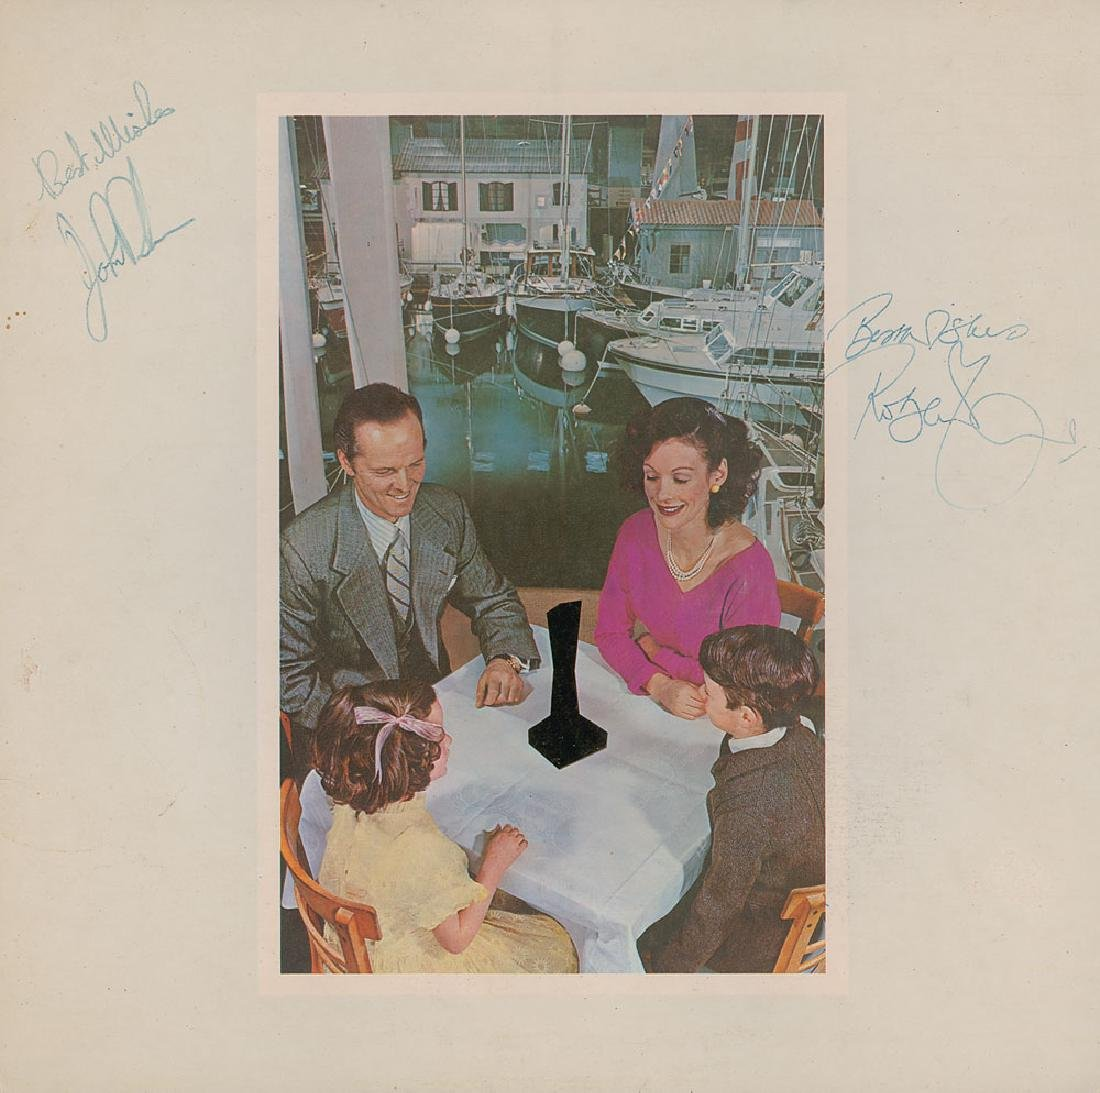 John Bonham and Robert Plant Signed Album